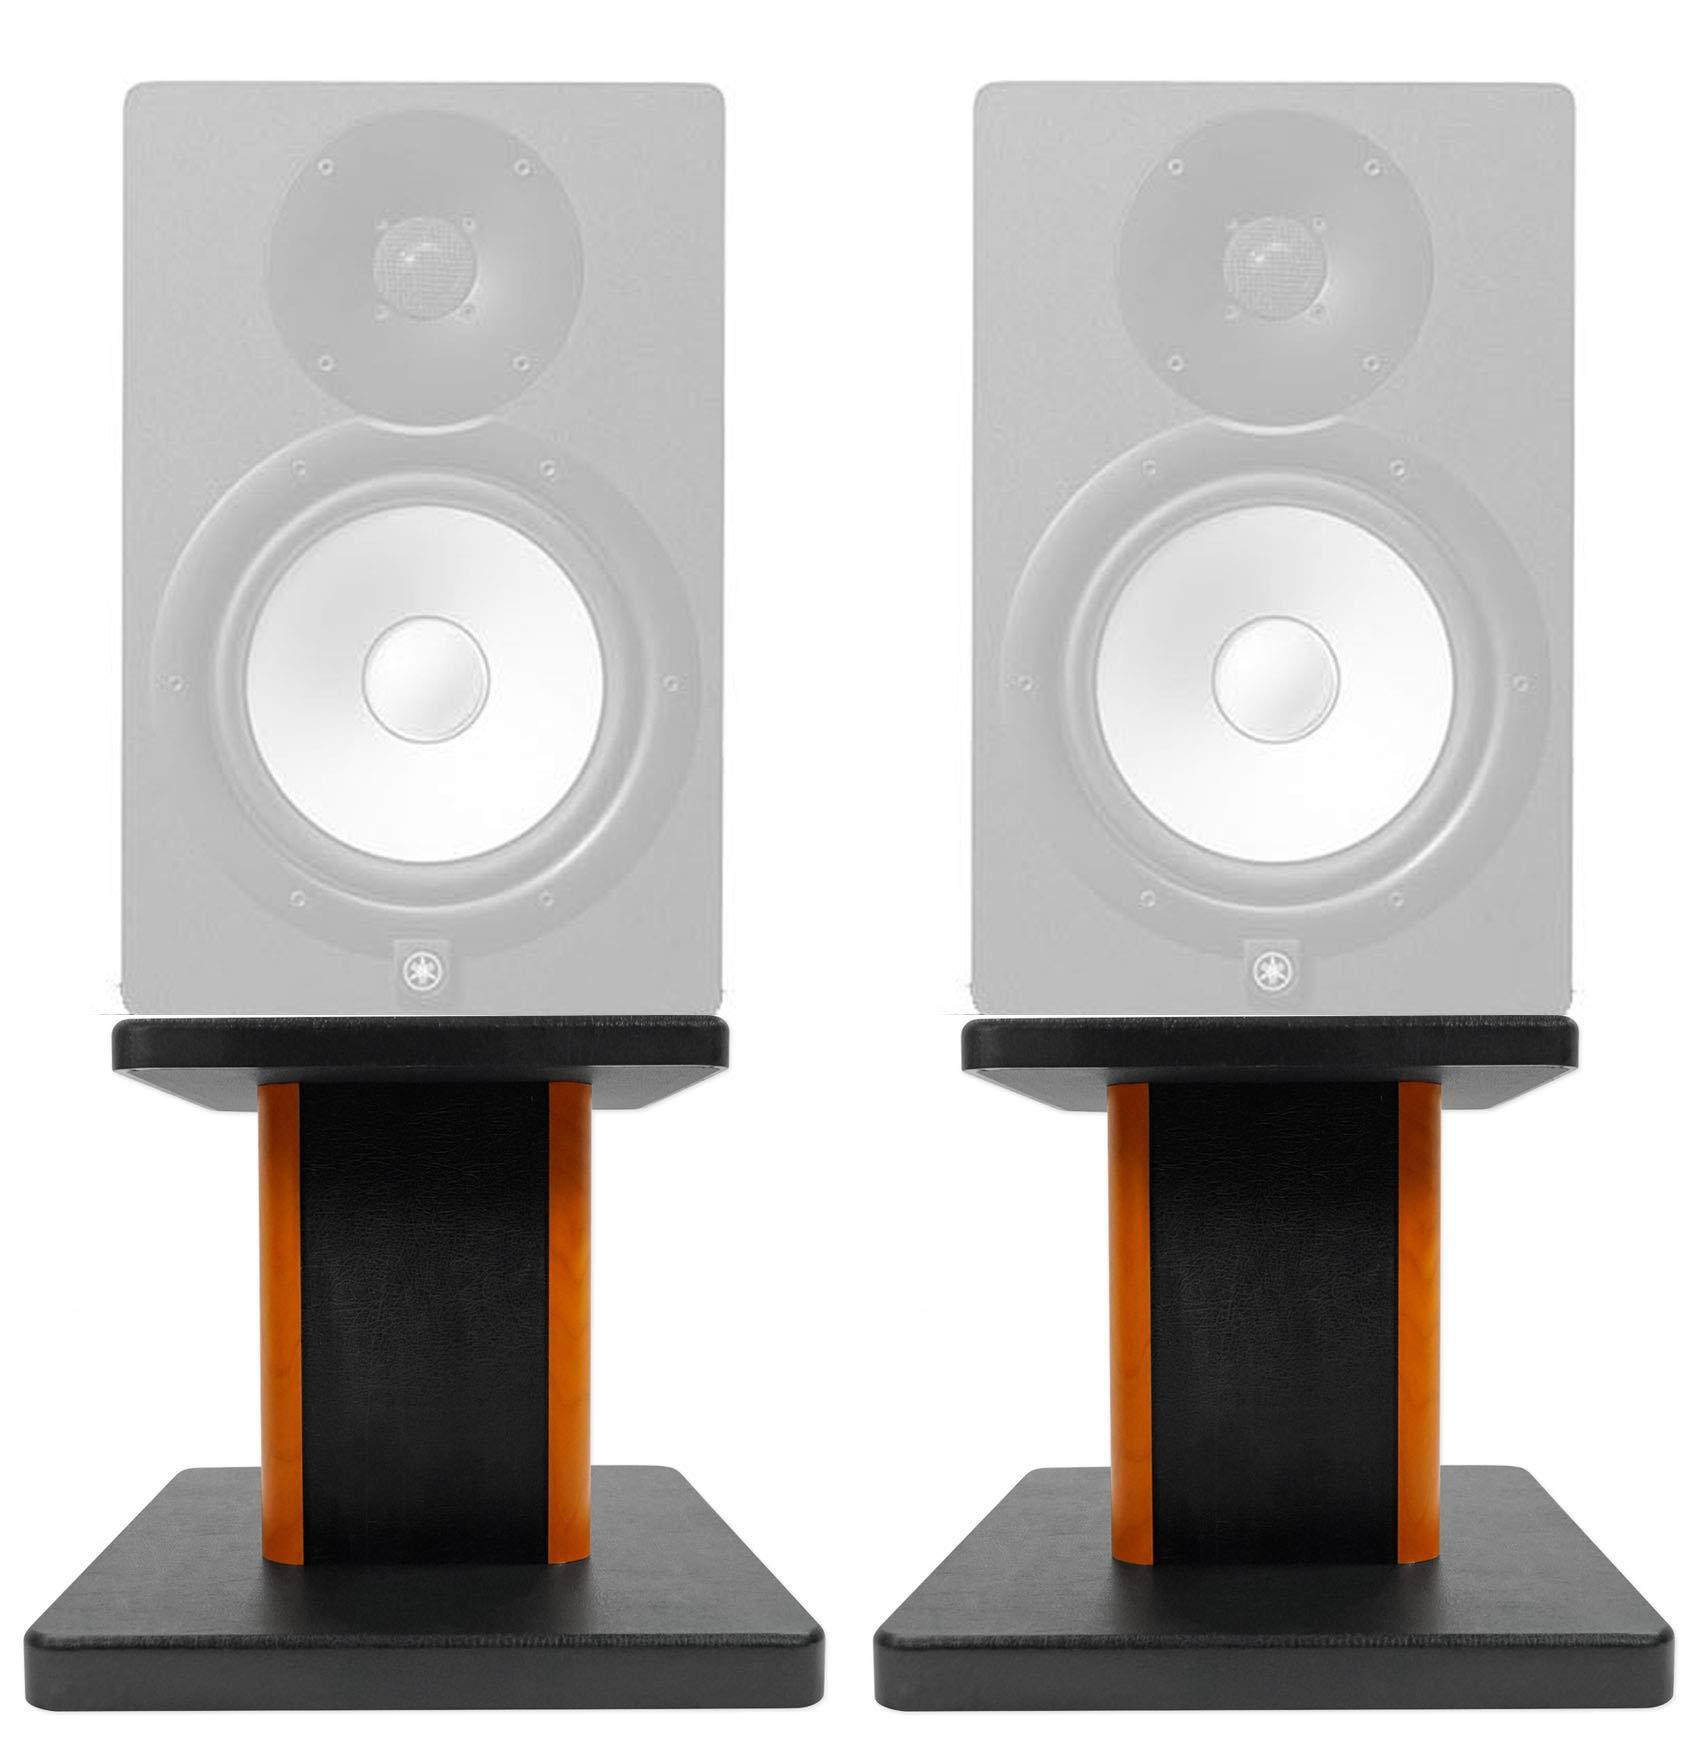 ROCKVILLE 8'' Wood Studio Monitor Speaker Stands for Yamaha HS5 Monitors by ROCKVILLE